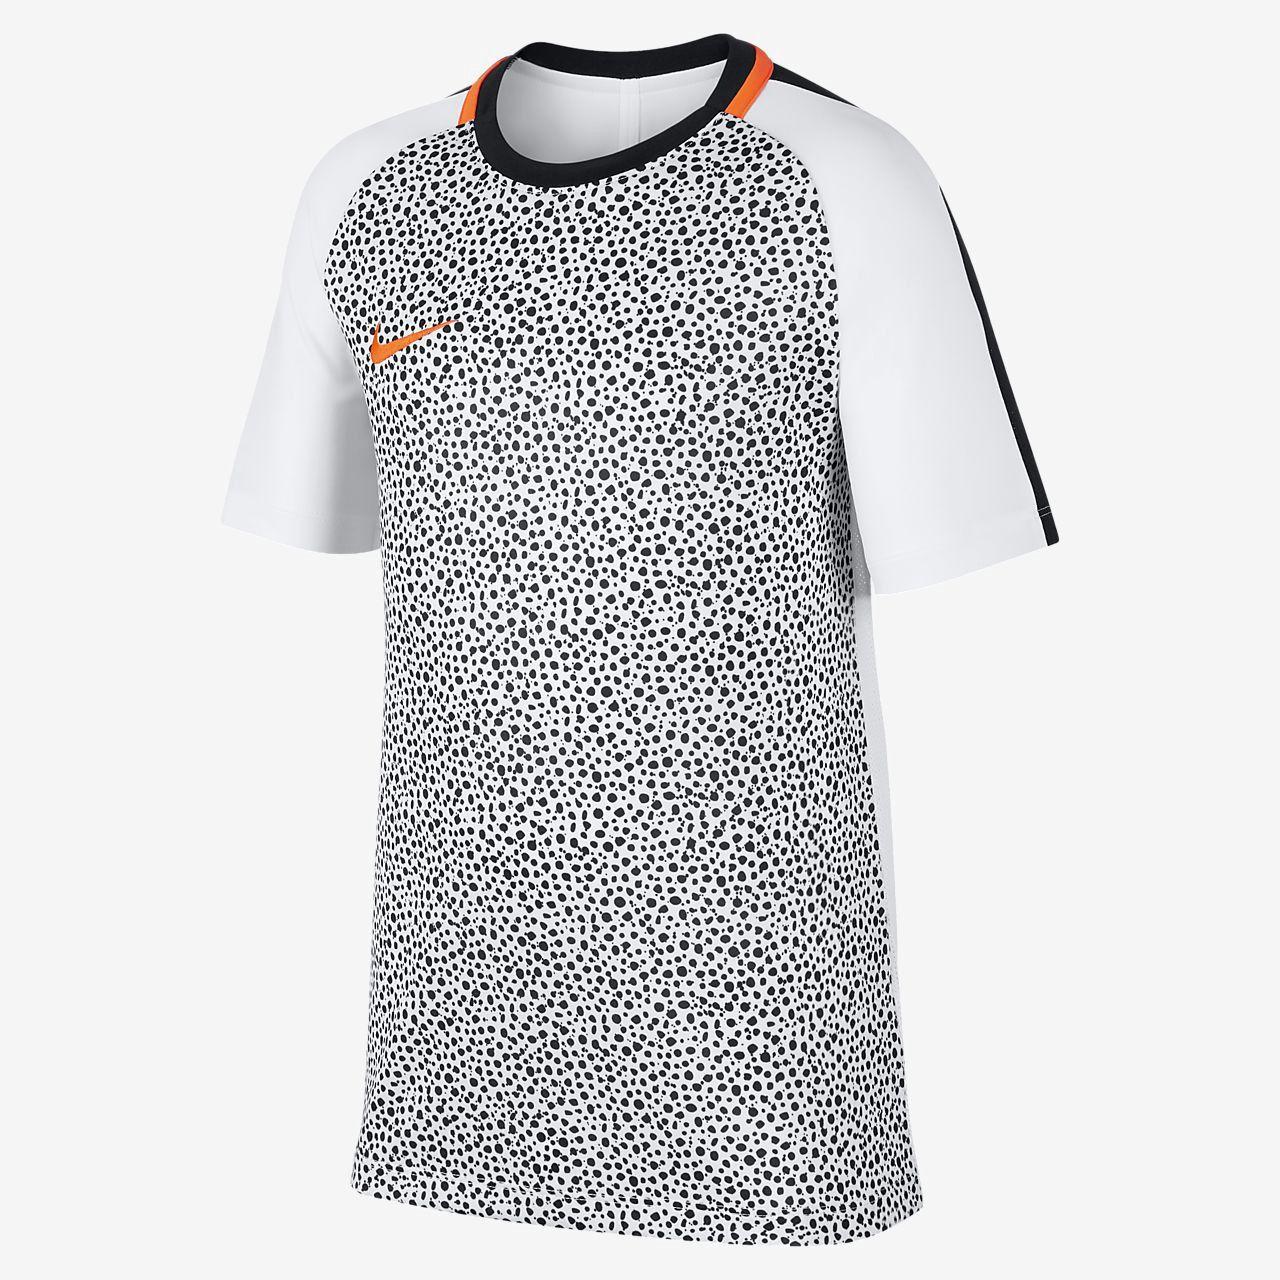 07fc1f6a2 Nike Dri-Fit Academy Big Kids' (Boys') Short Sleeve Soccer Top - M (10-12)  Orange